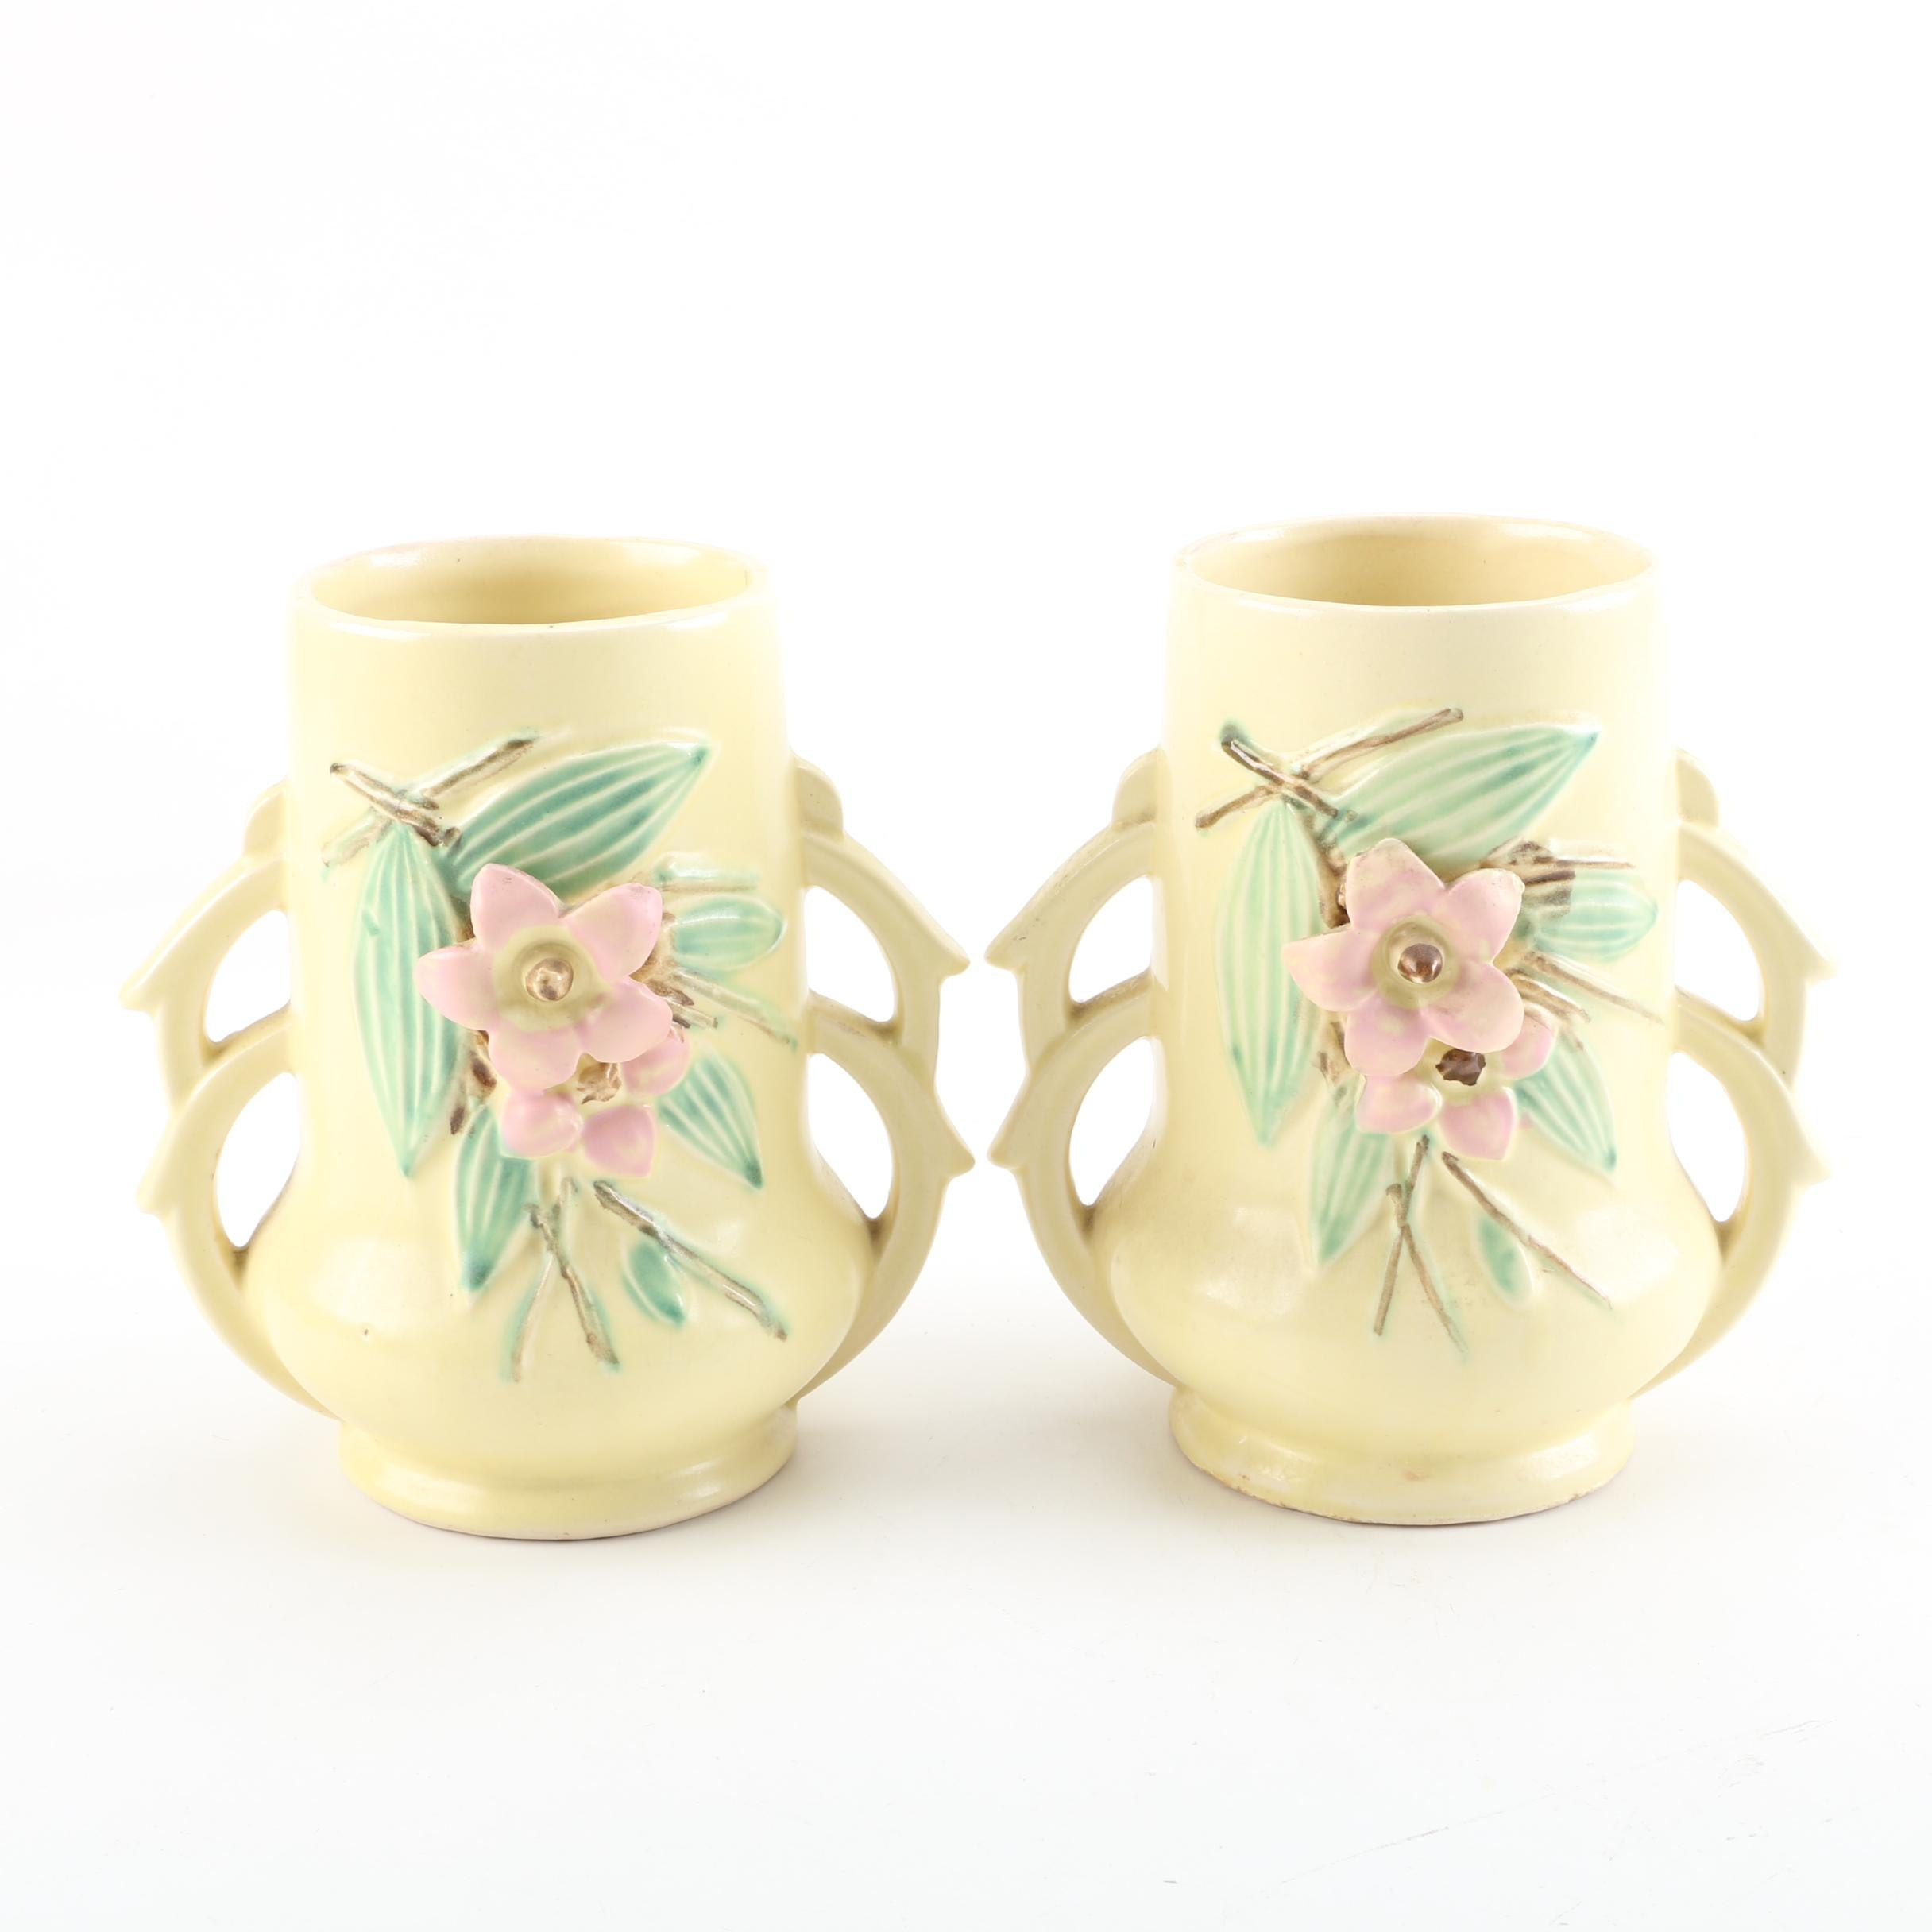 "1940s McCoy Pottery ""Blossom Time"" Handled Vases"